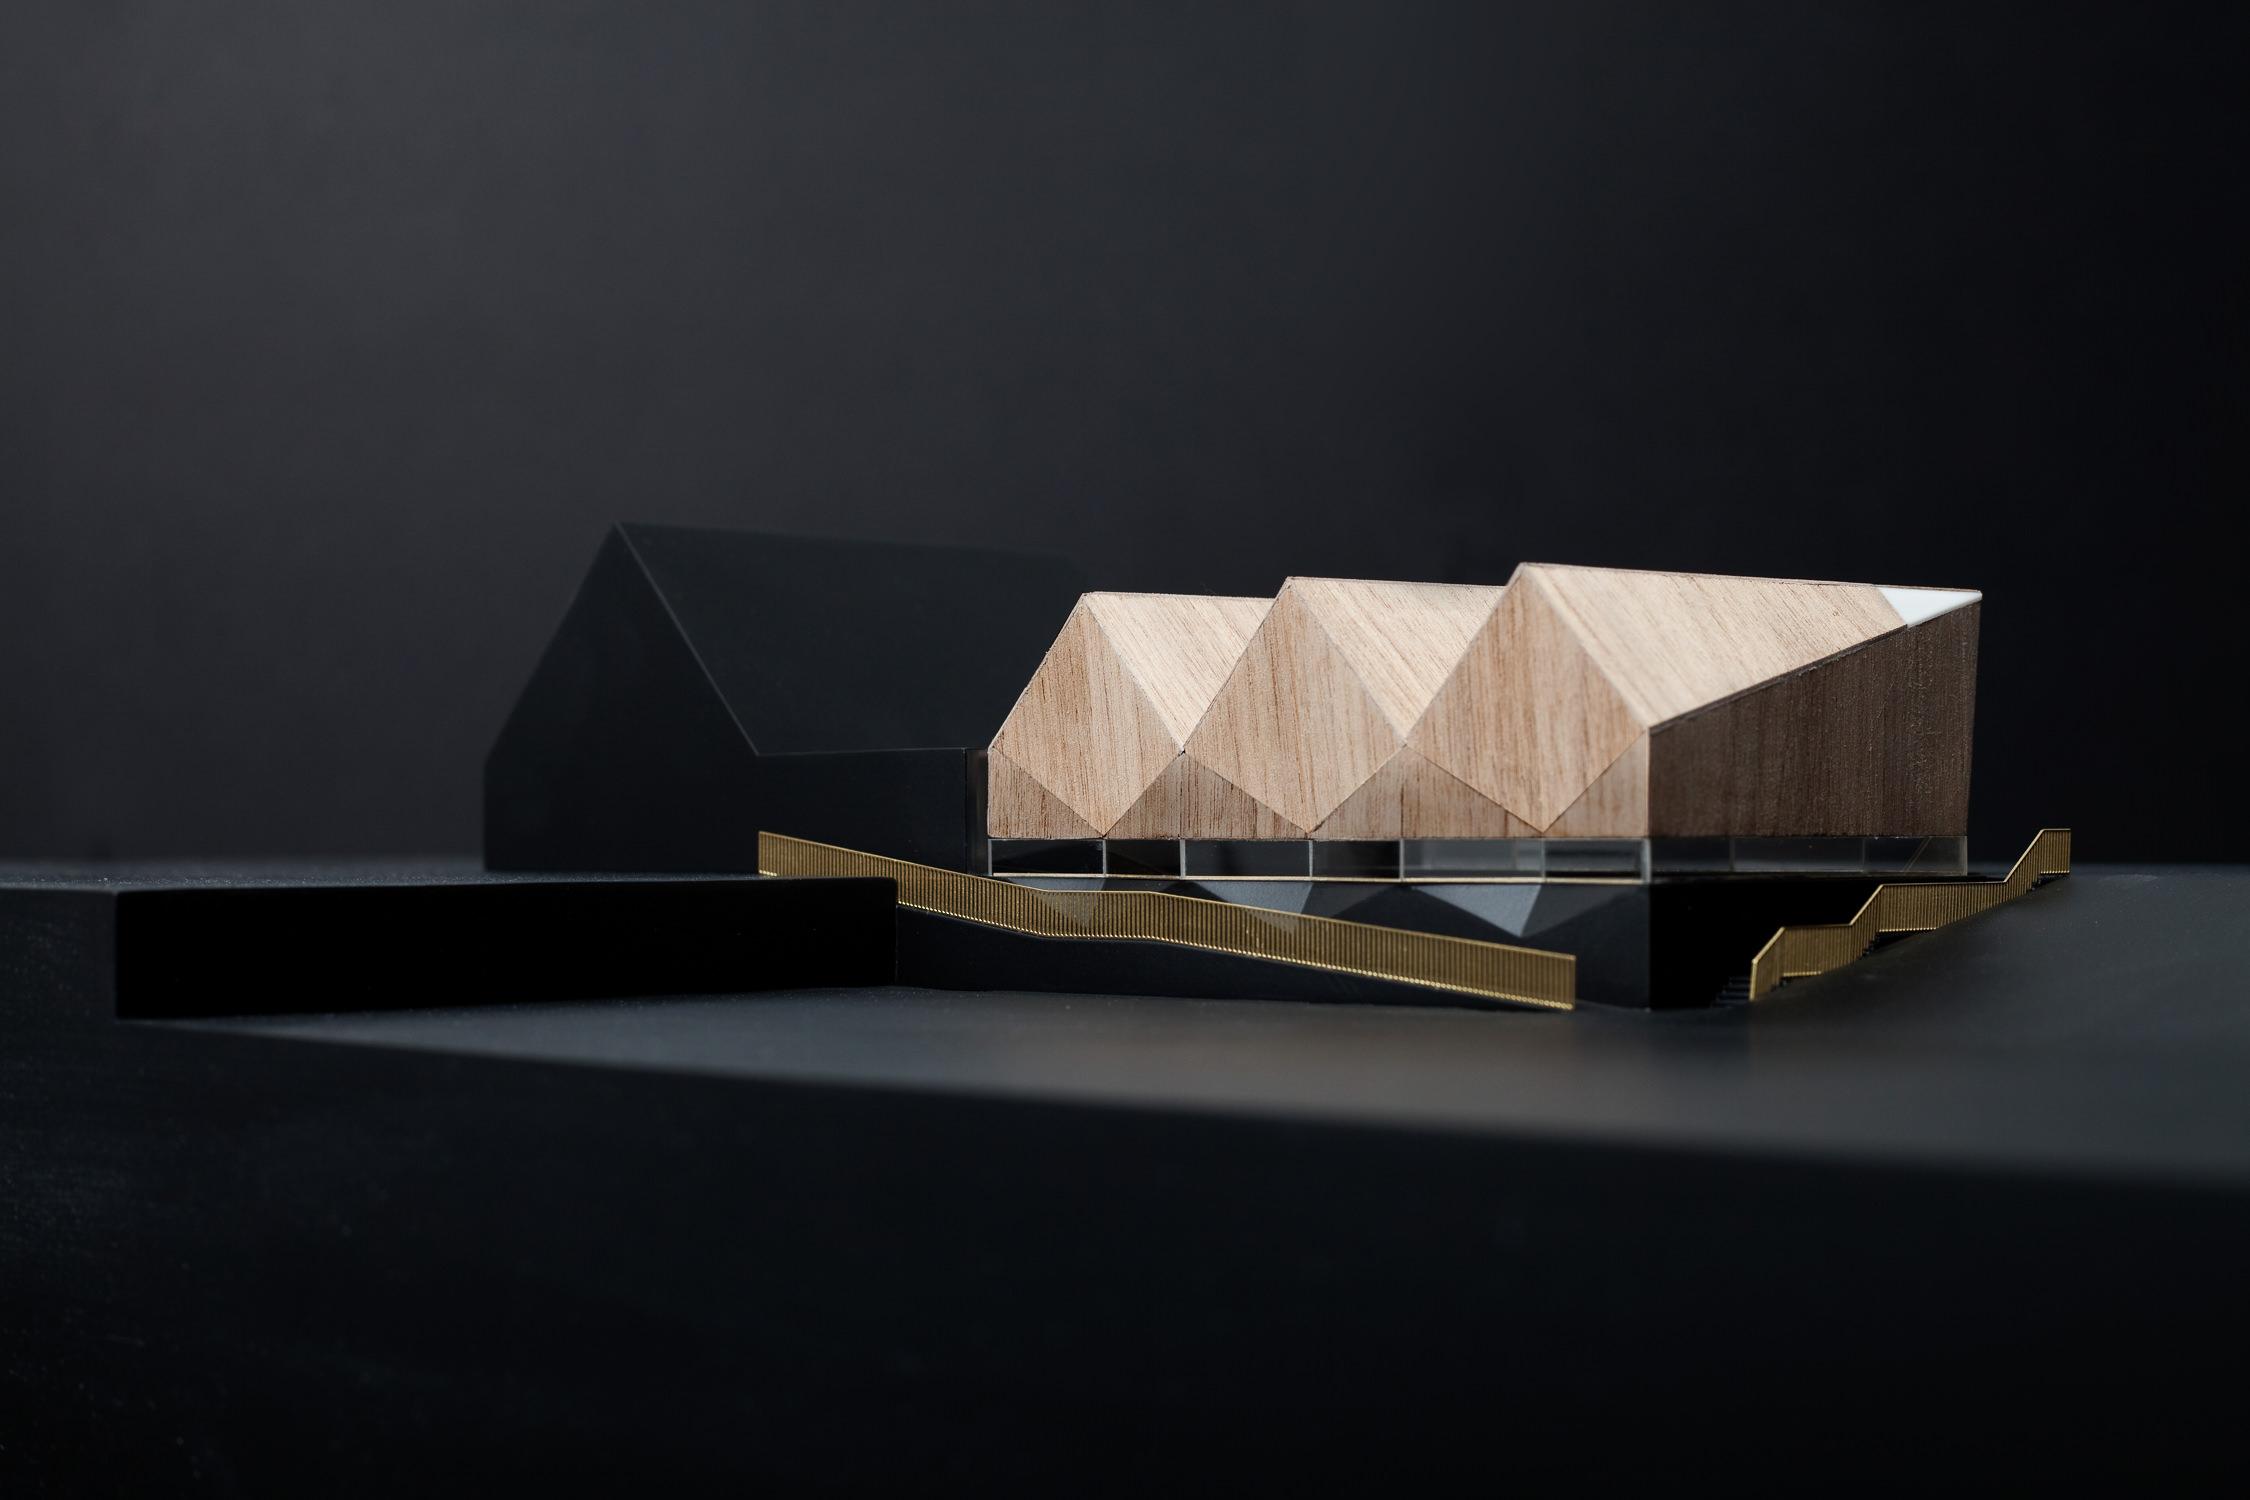 mark-hadden-architecture-photographer-architectuur-interieur-fotografie-london-dma-alfriston-model024-.jpg